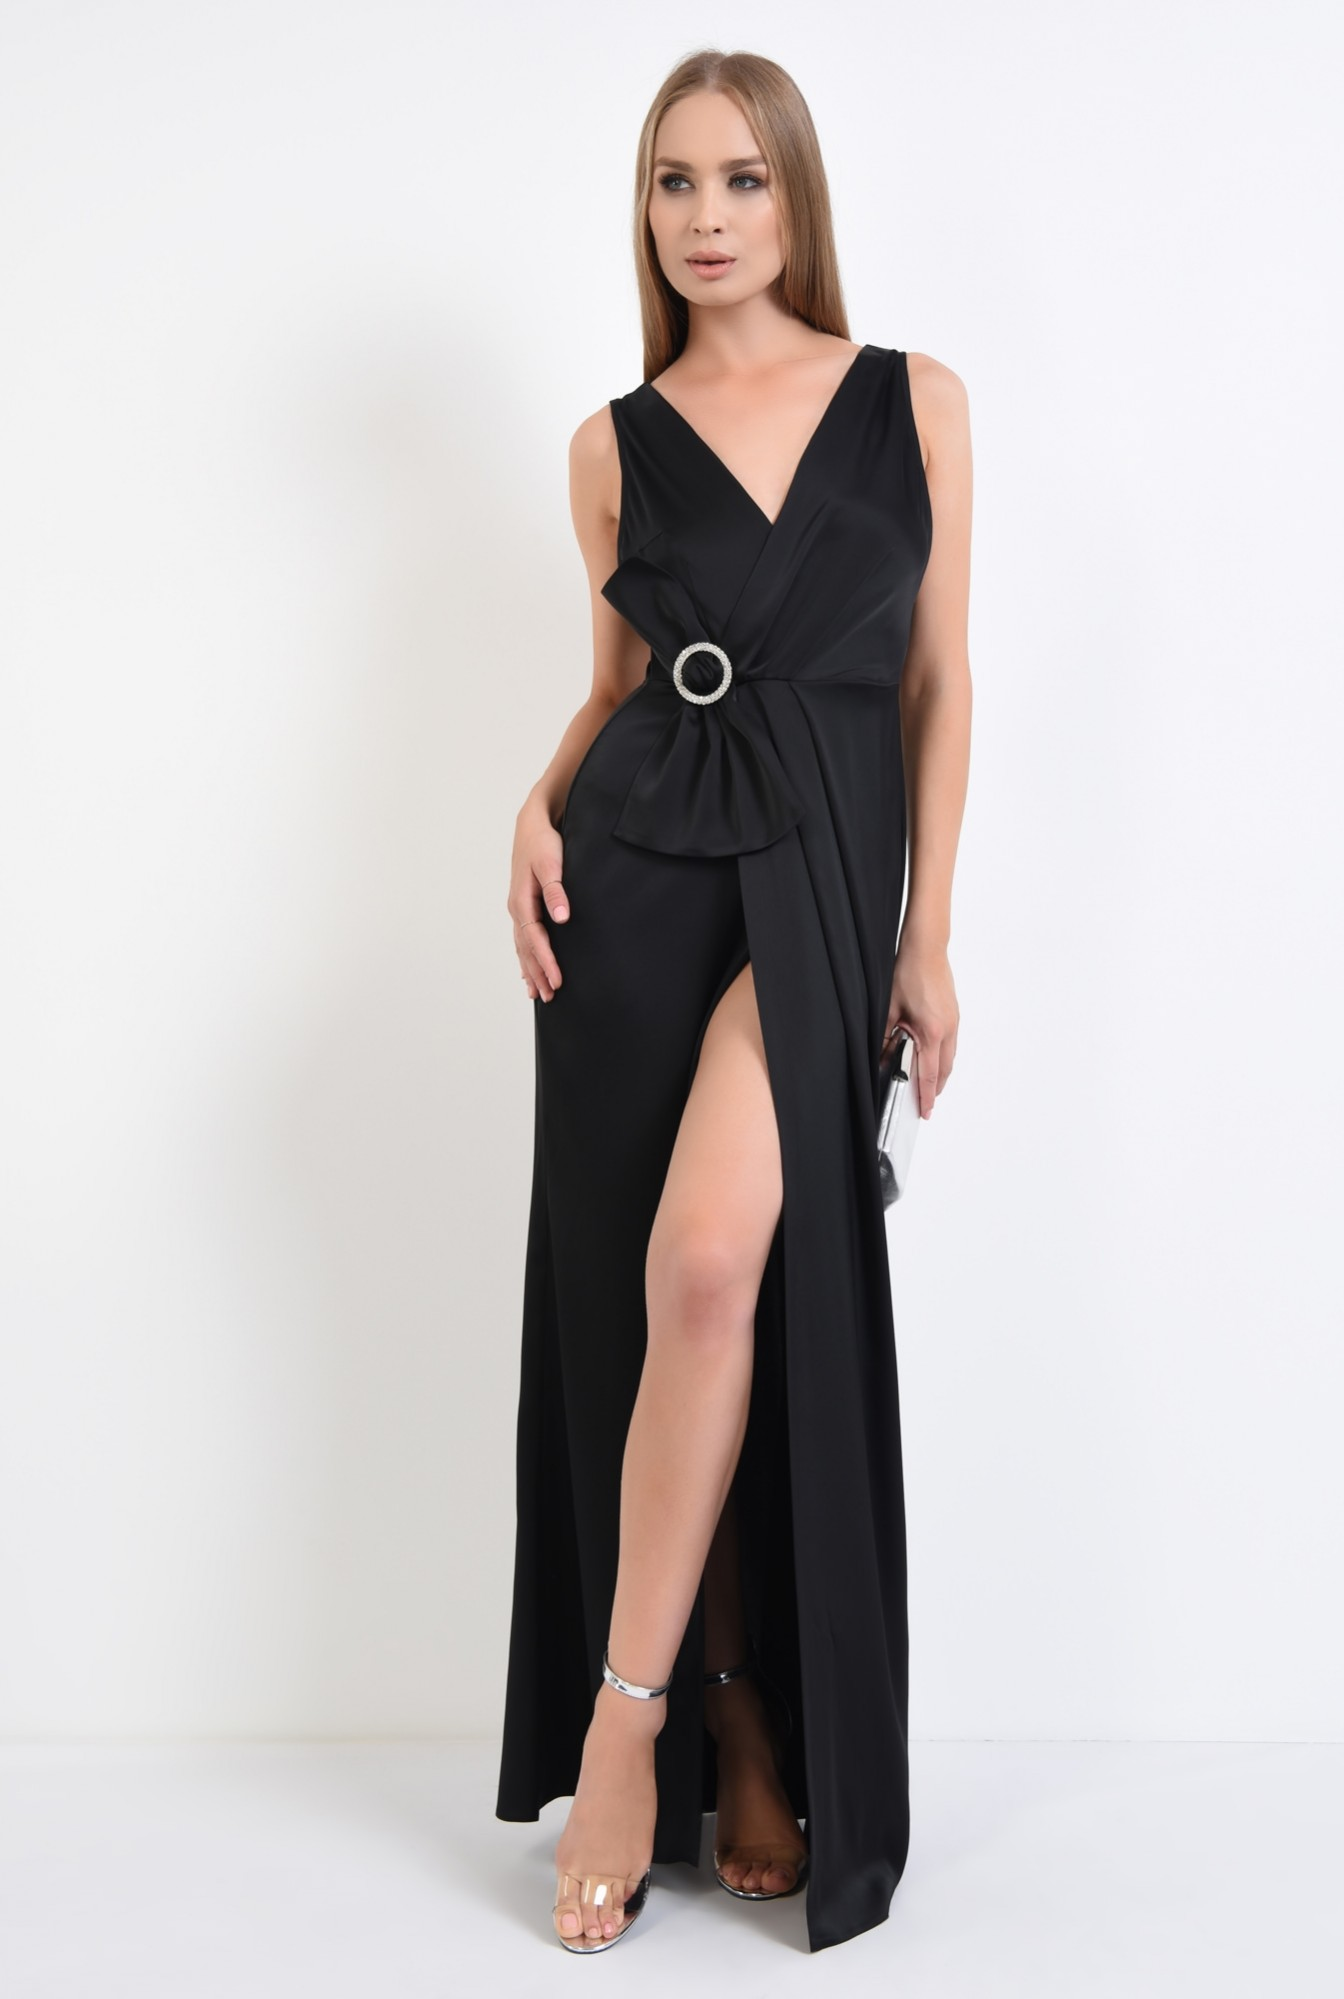 3 - rochie de seara, petrecuta, neagra, satin, cu funda, strasuri